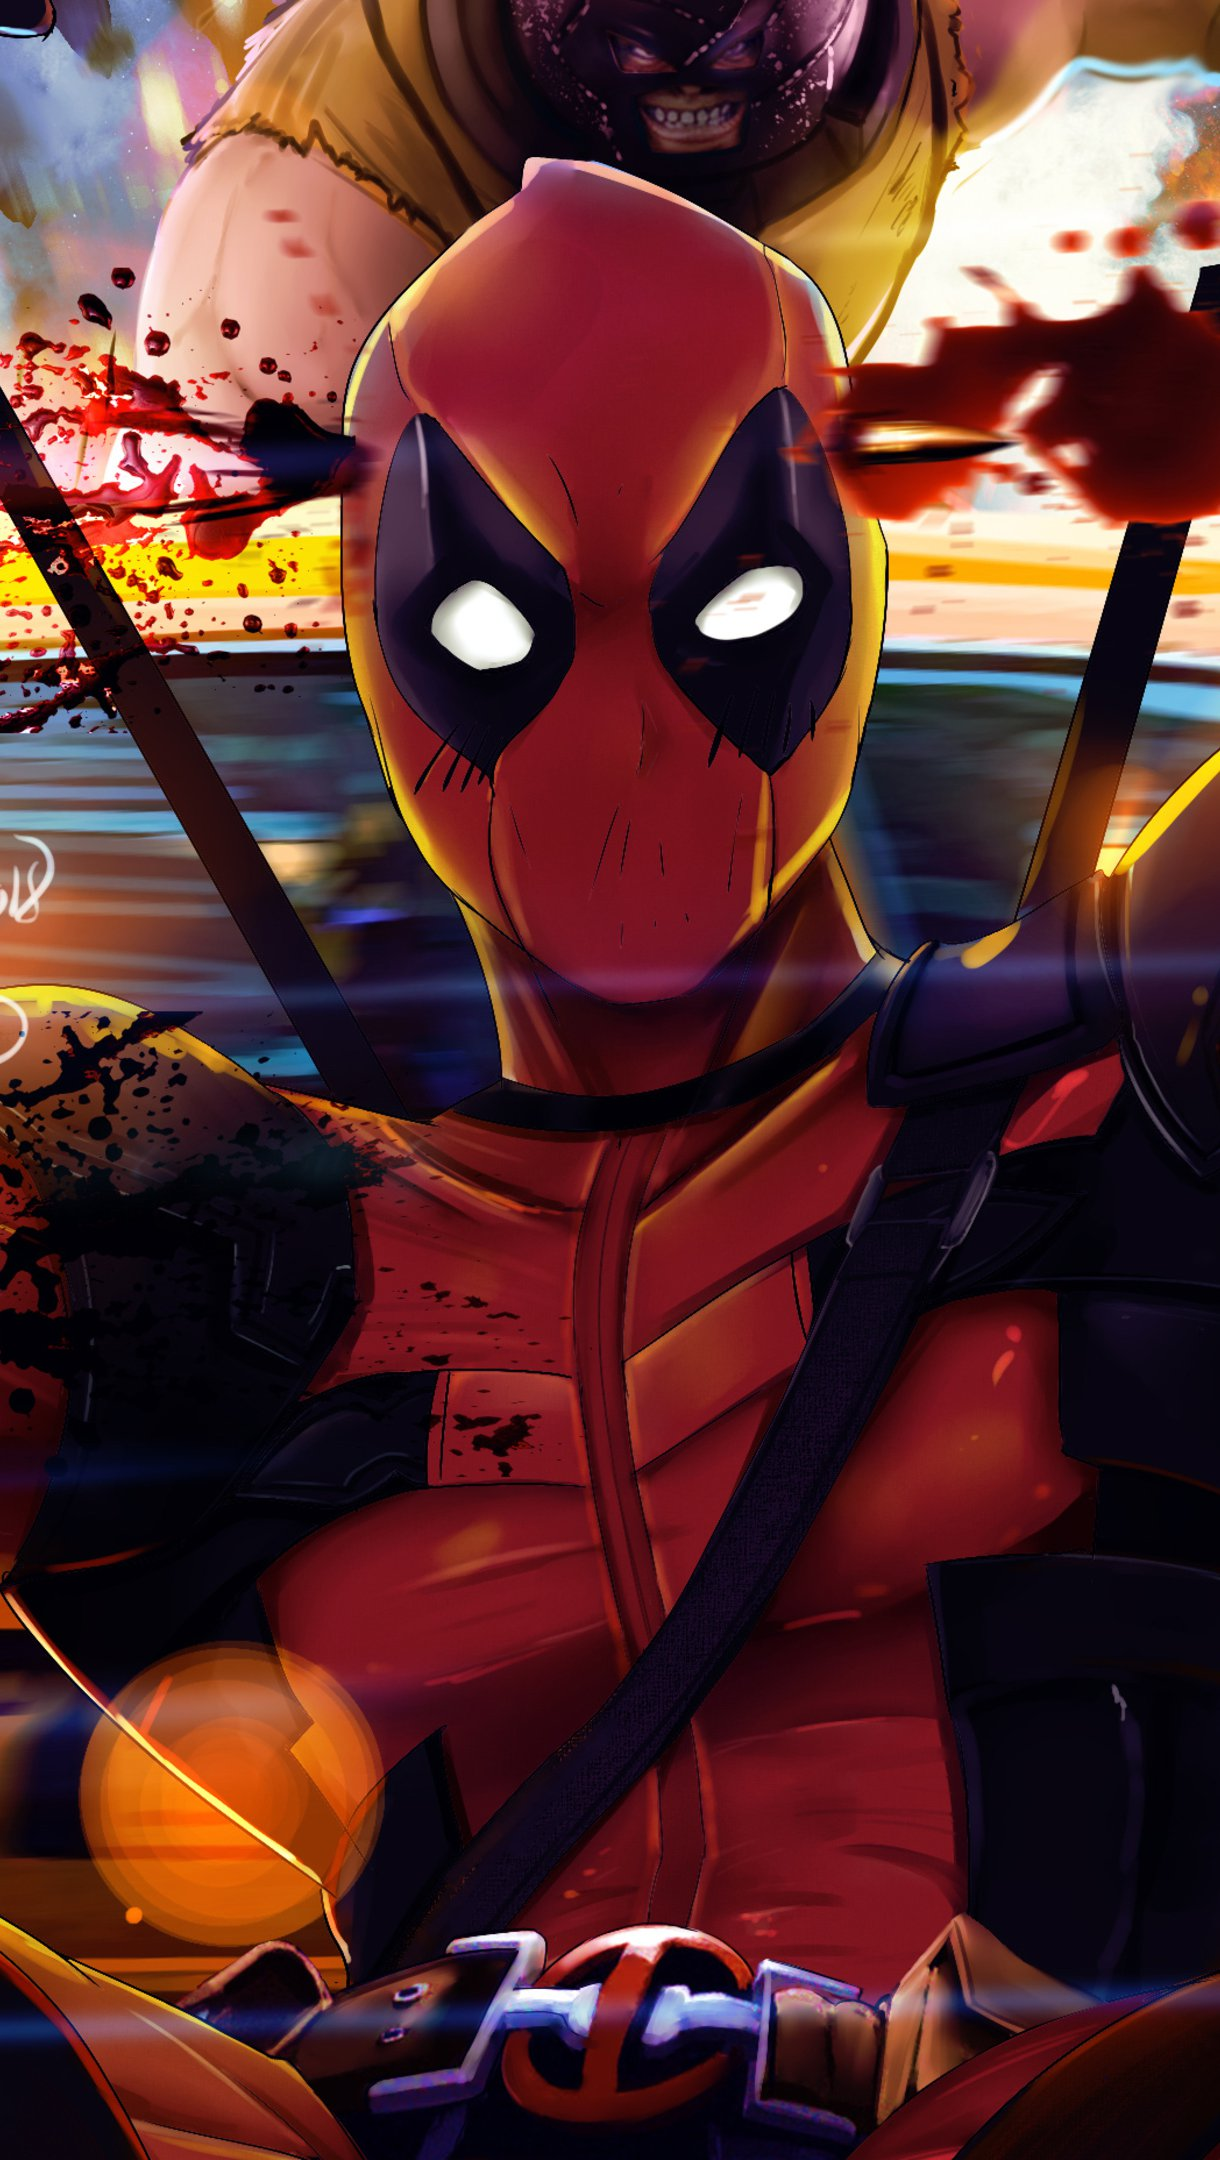 Fondos de pantalla Deadpool 2 Artwork Vertical